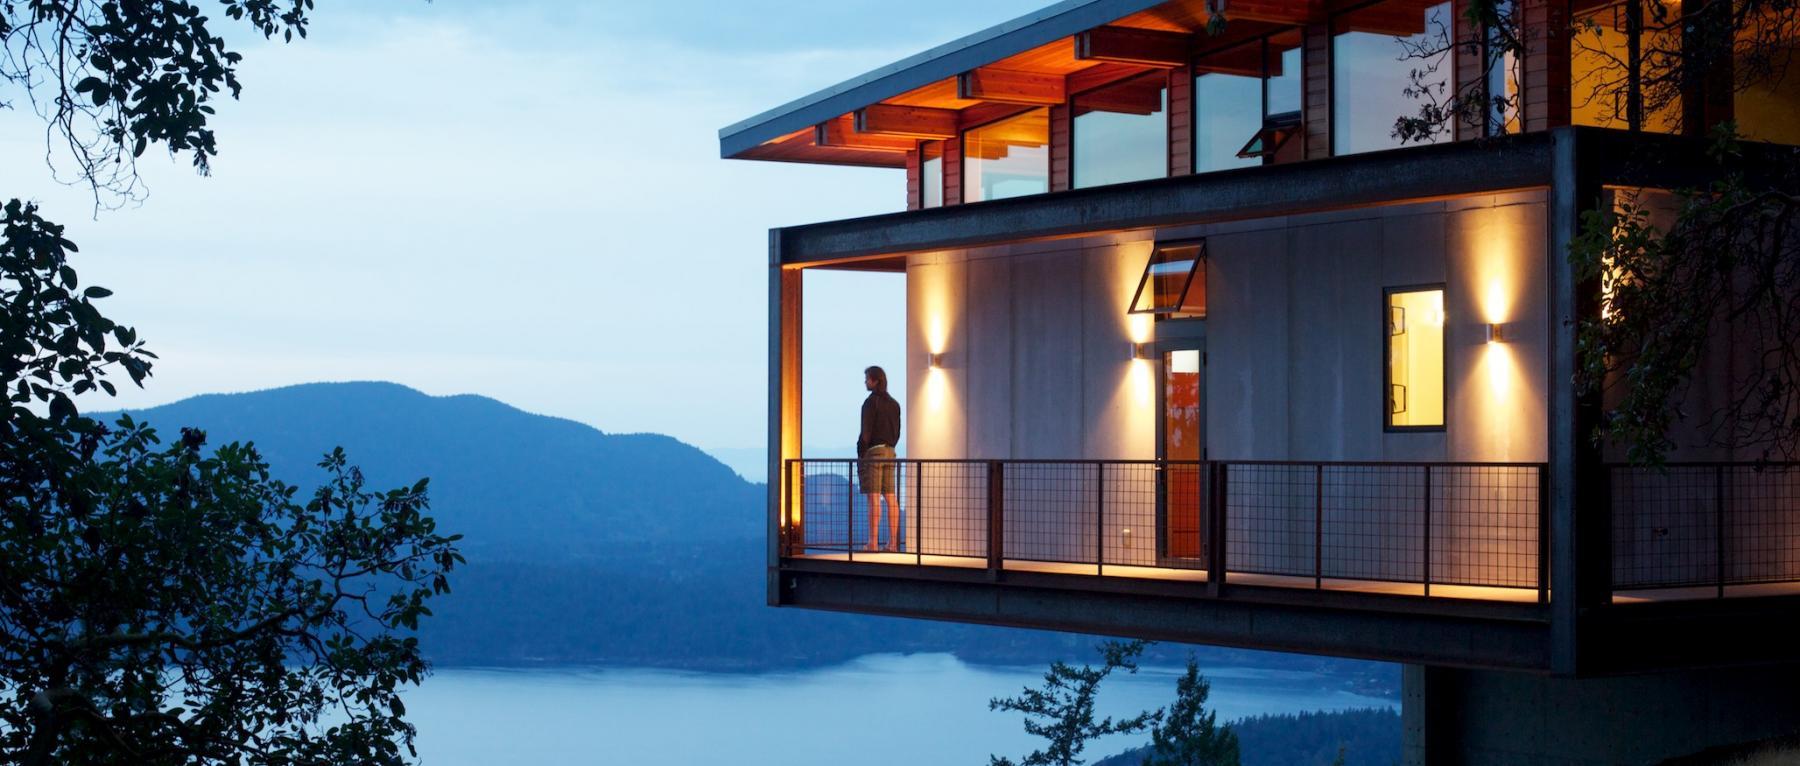 indigo architecture interiors. Black Bedroom Furniture Sets. Home Design Ideas